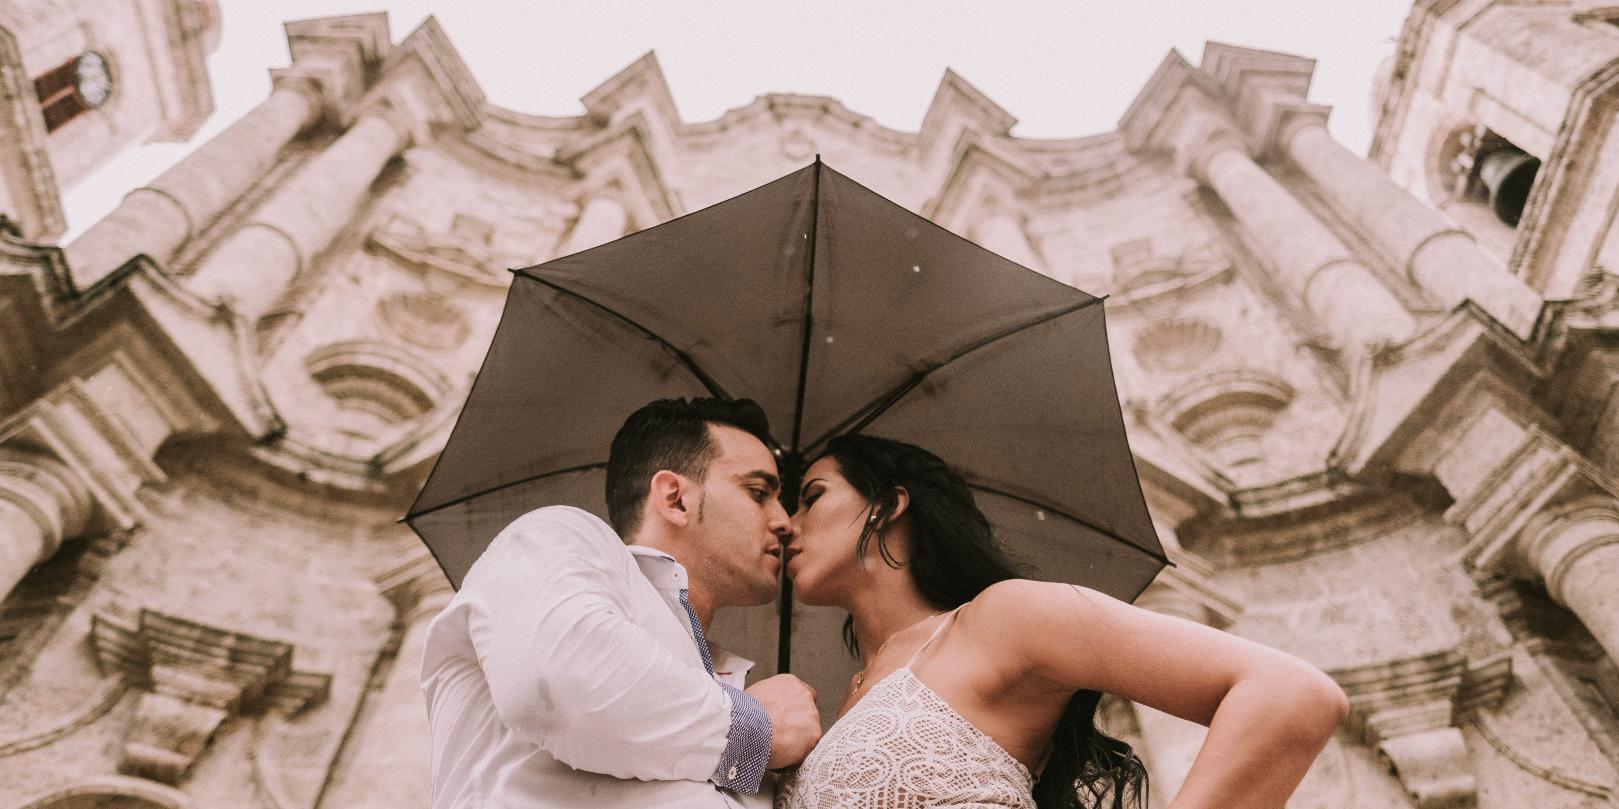 bodas-sin-clasificar-sin-tema-cuba-35231.jpg